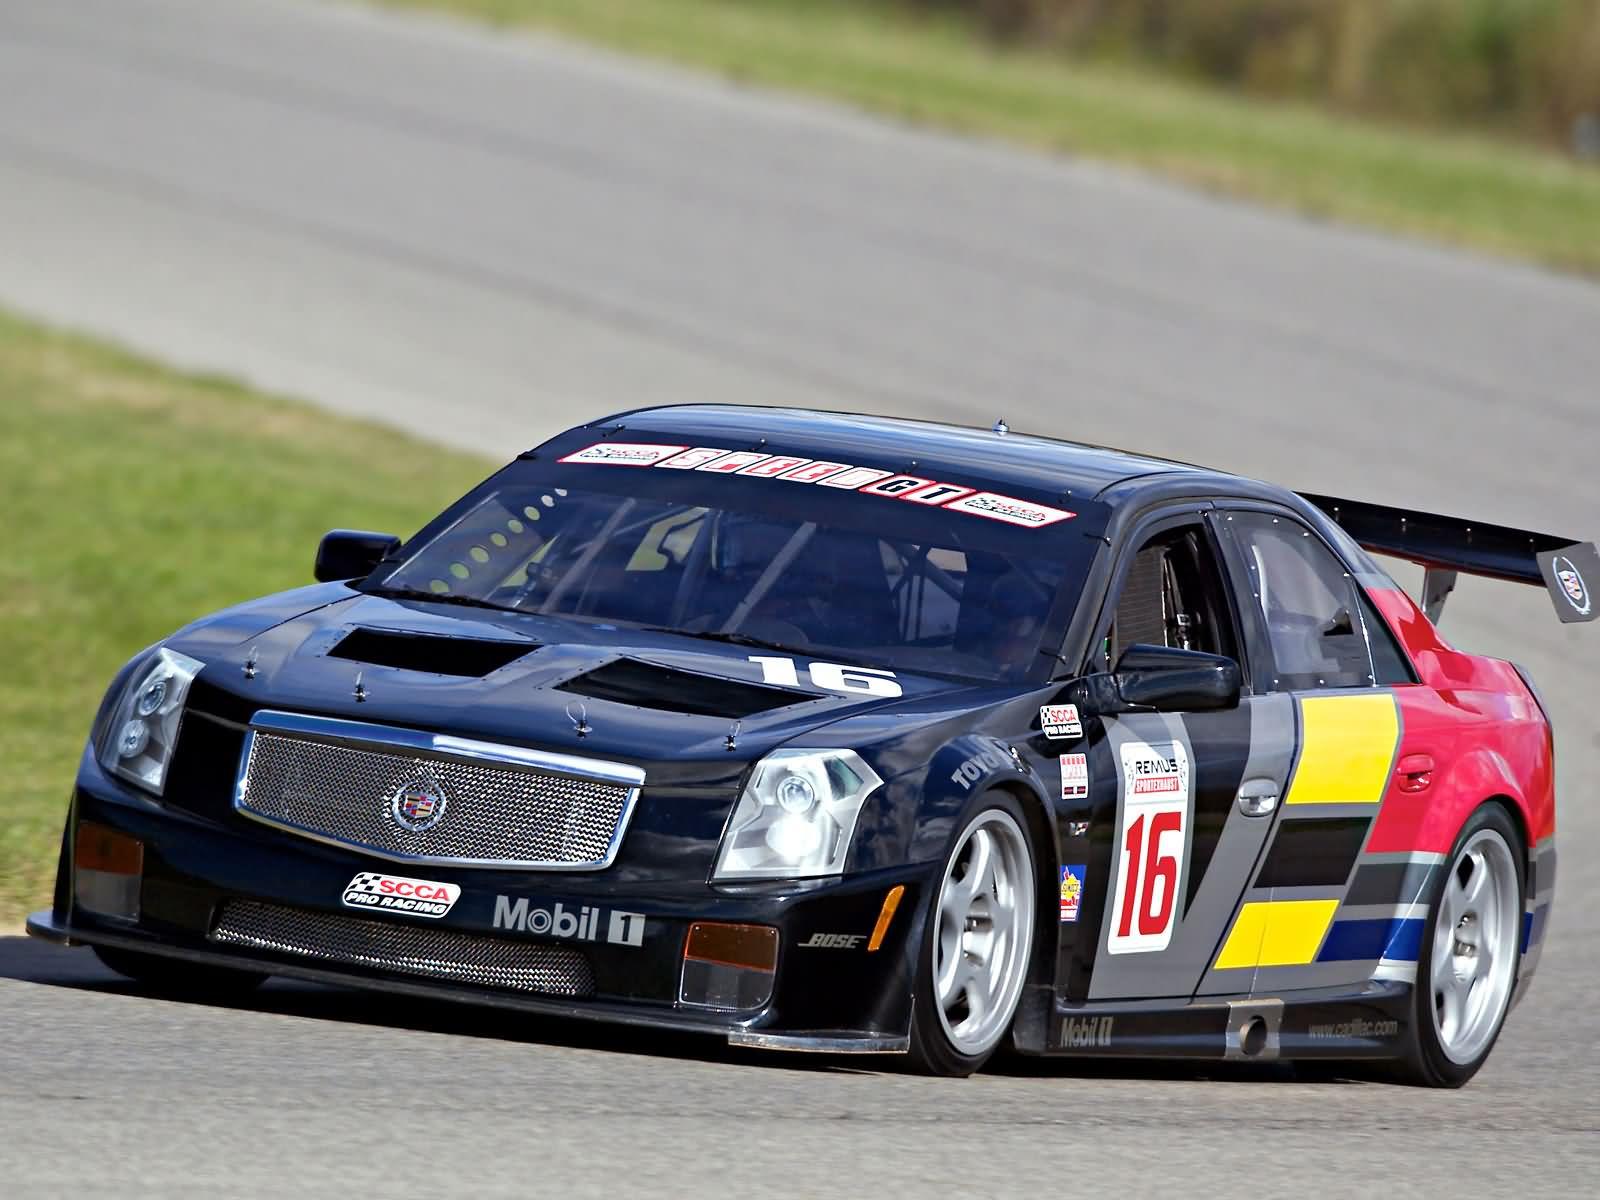 Cadillac Cts V Race Car The Best Car HD Wallpaper 1600x1200